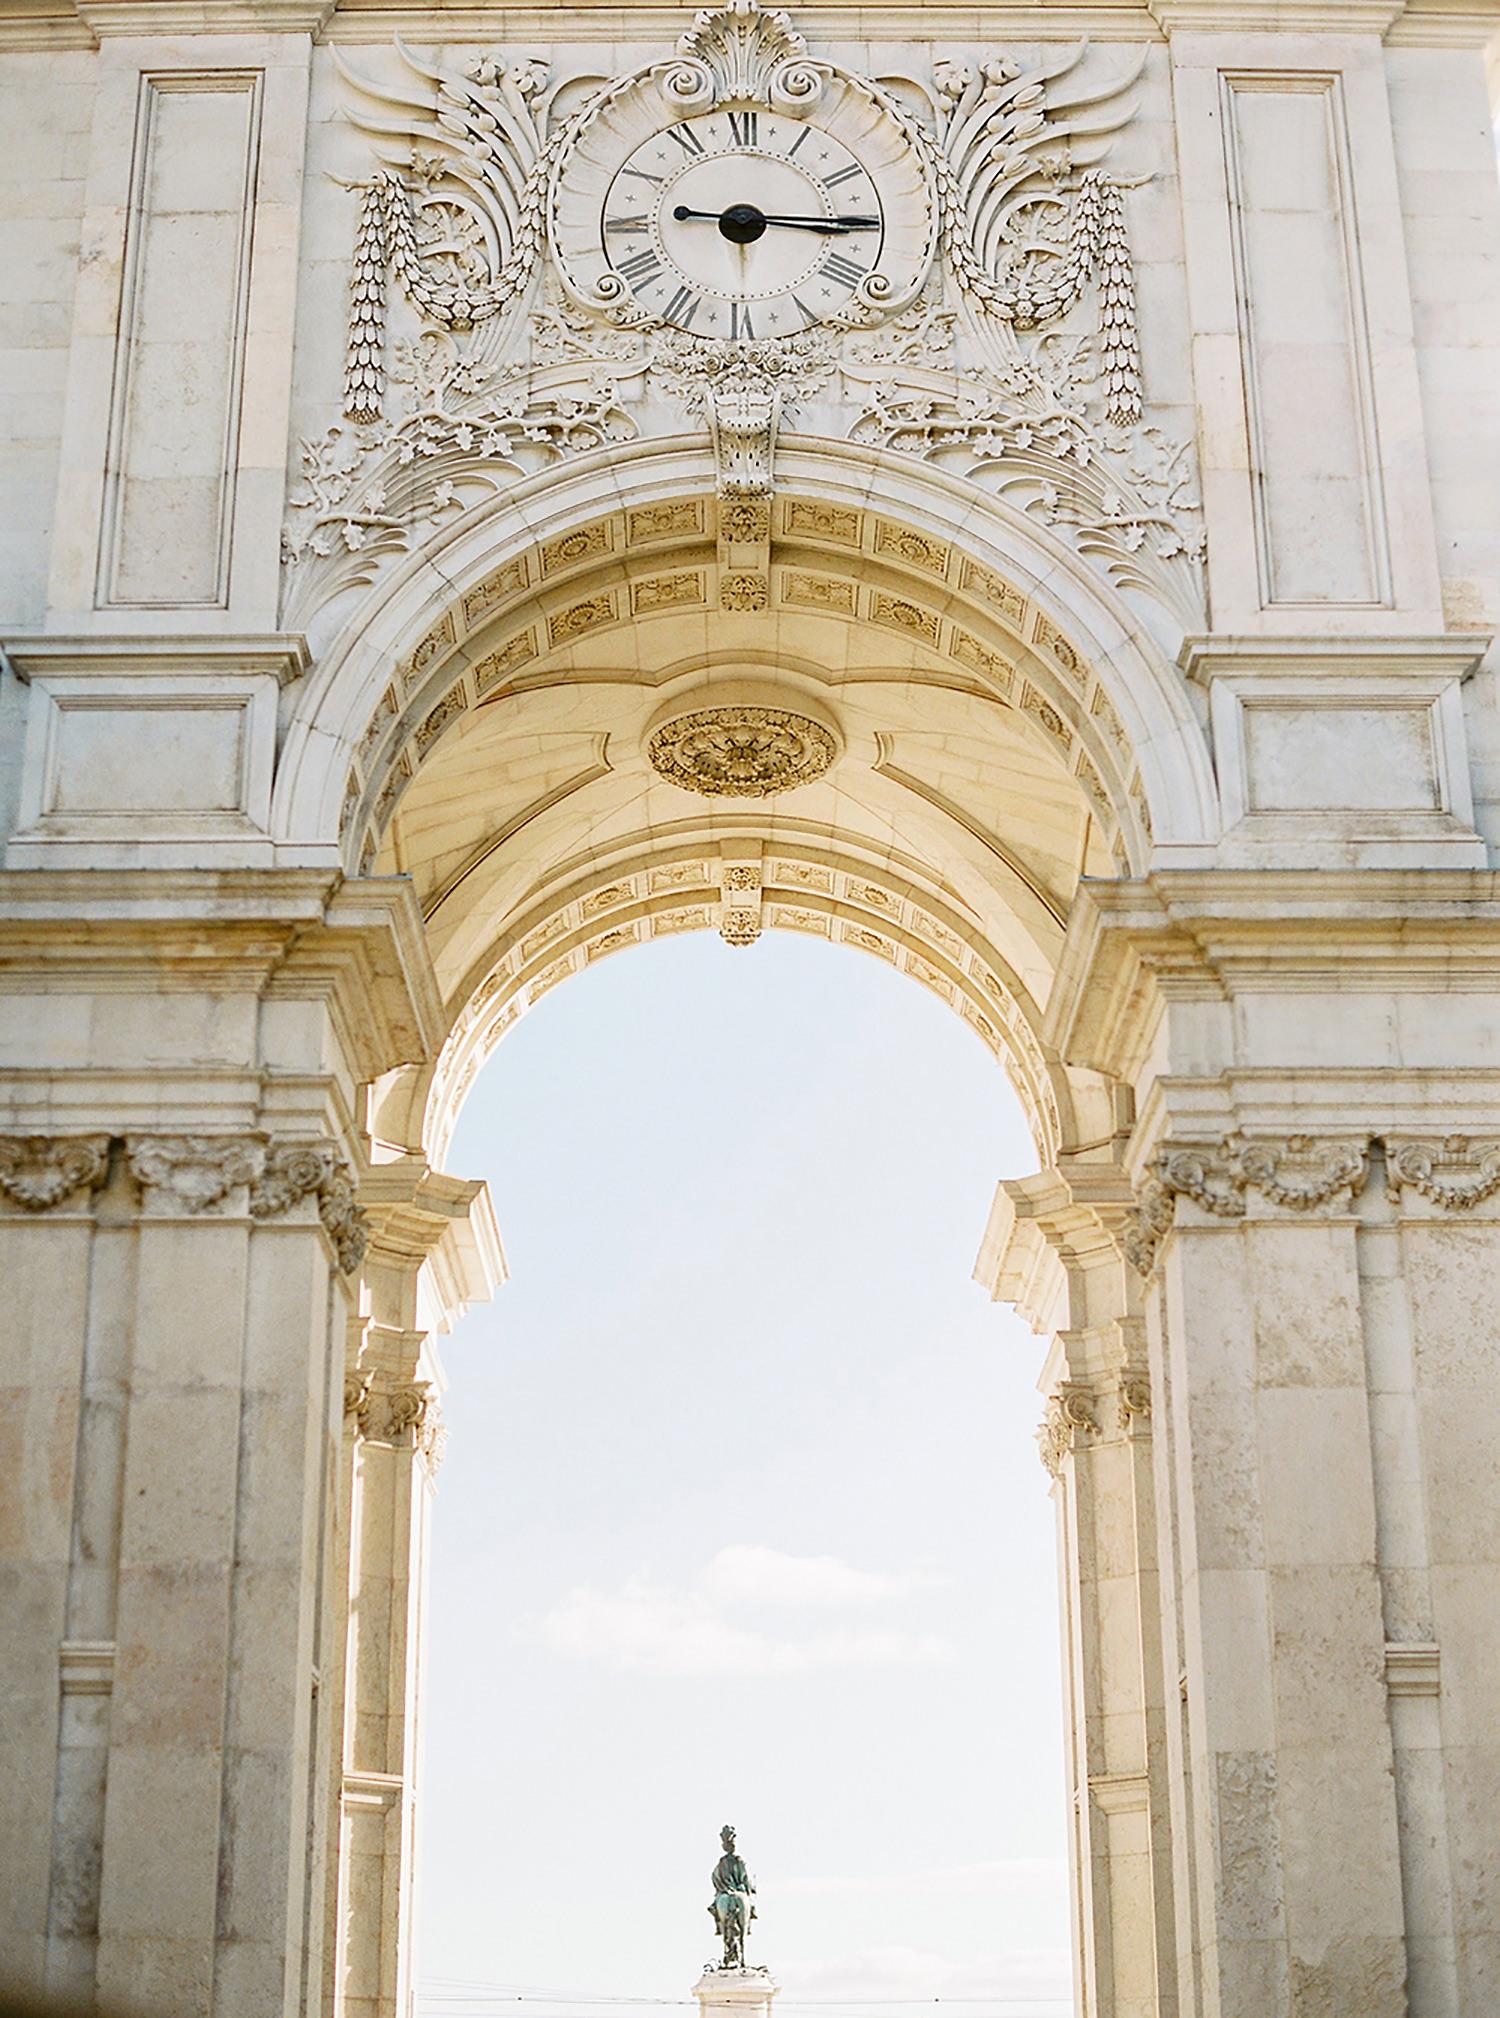 Spectacular Arco da Rua Augusta, a must see when visiting the city